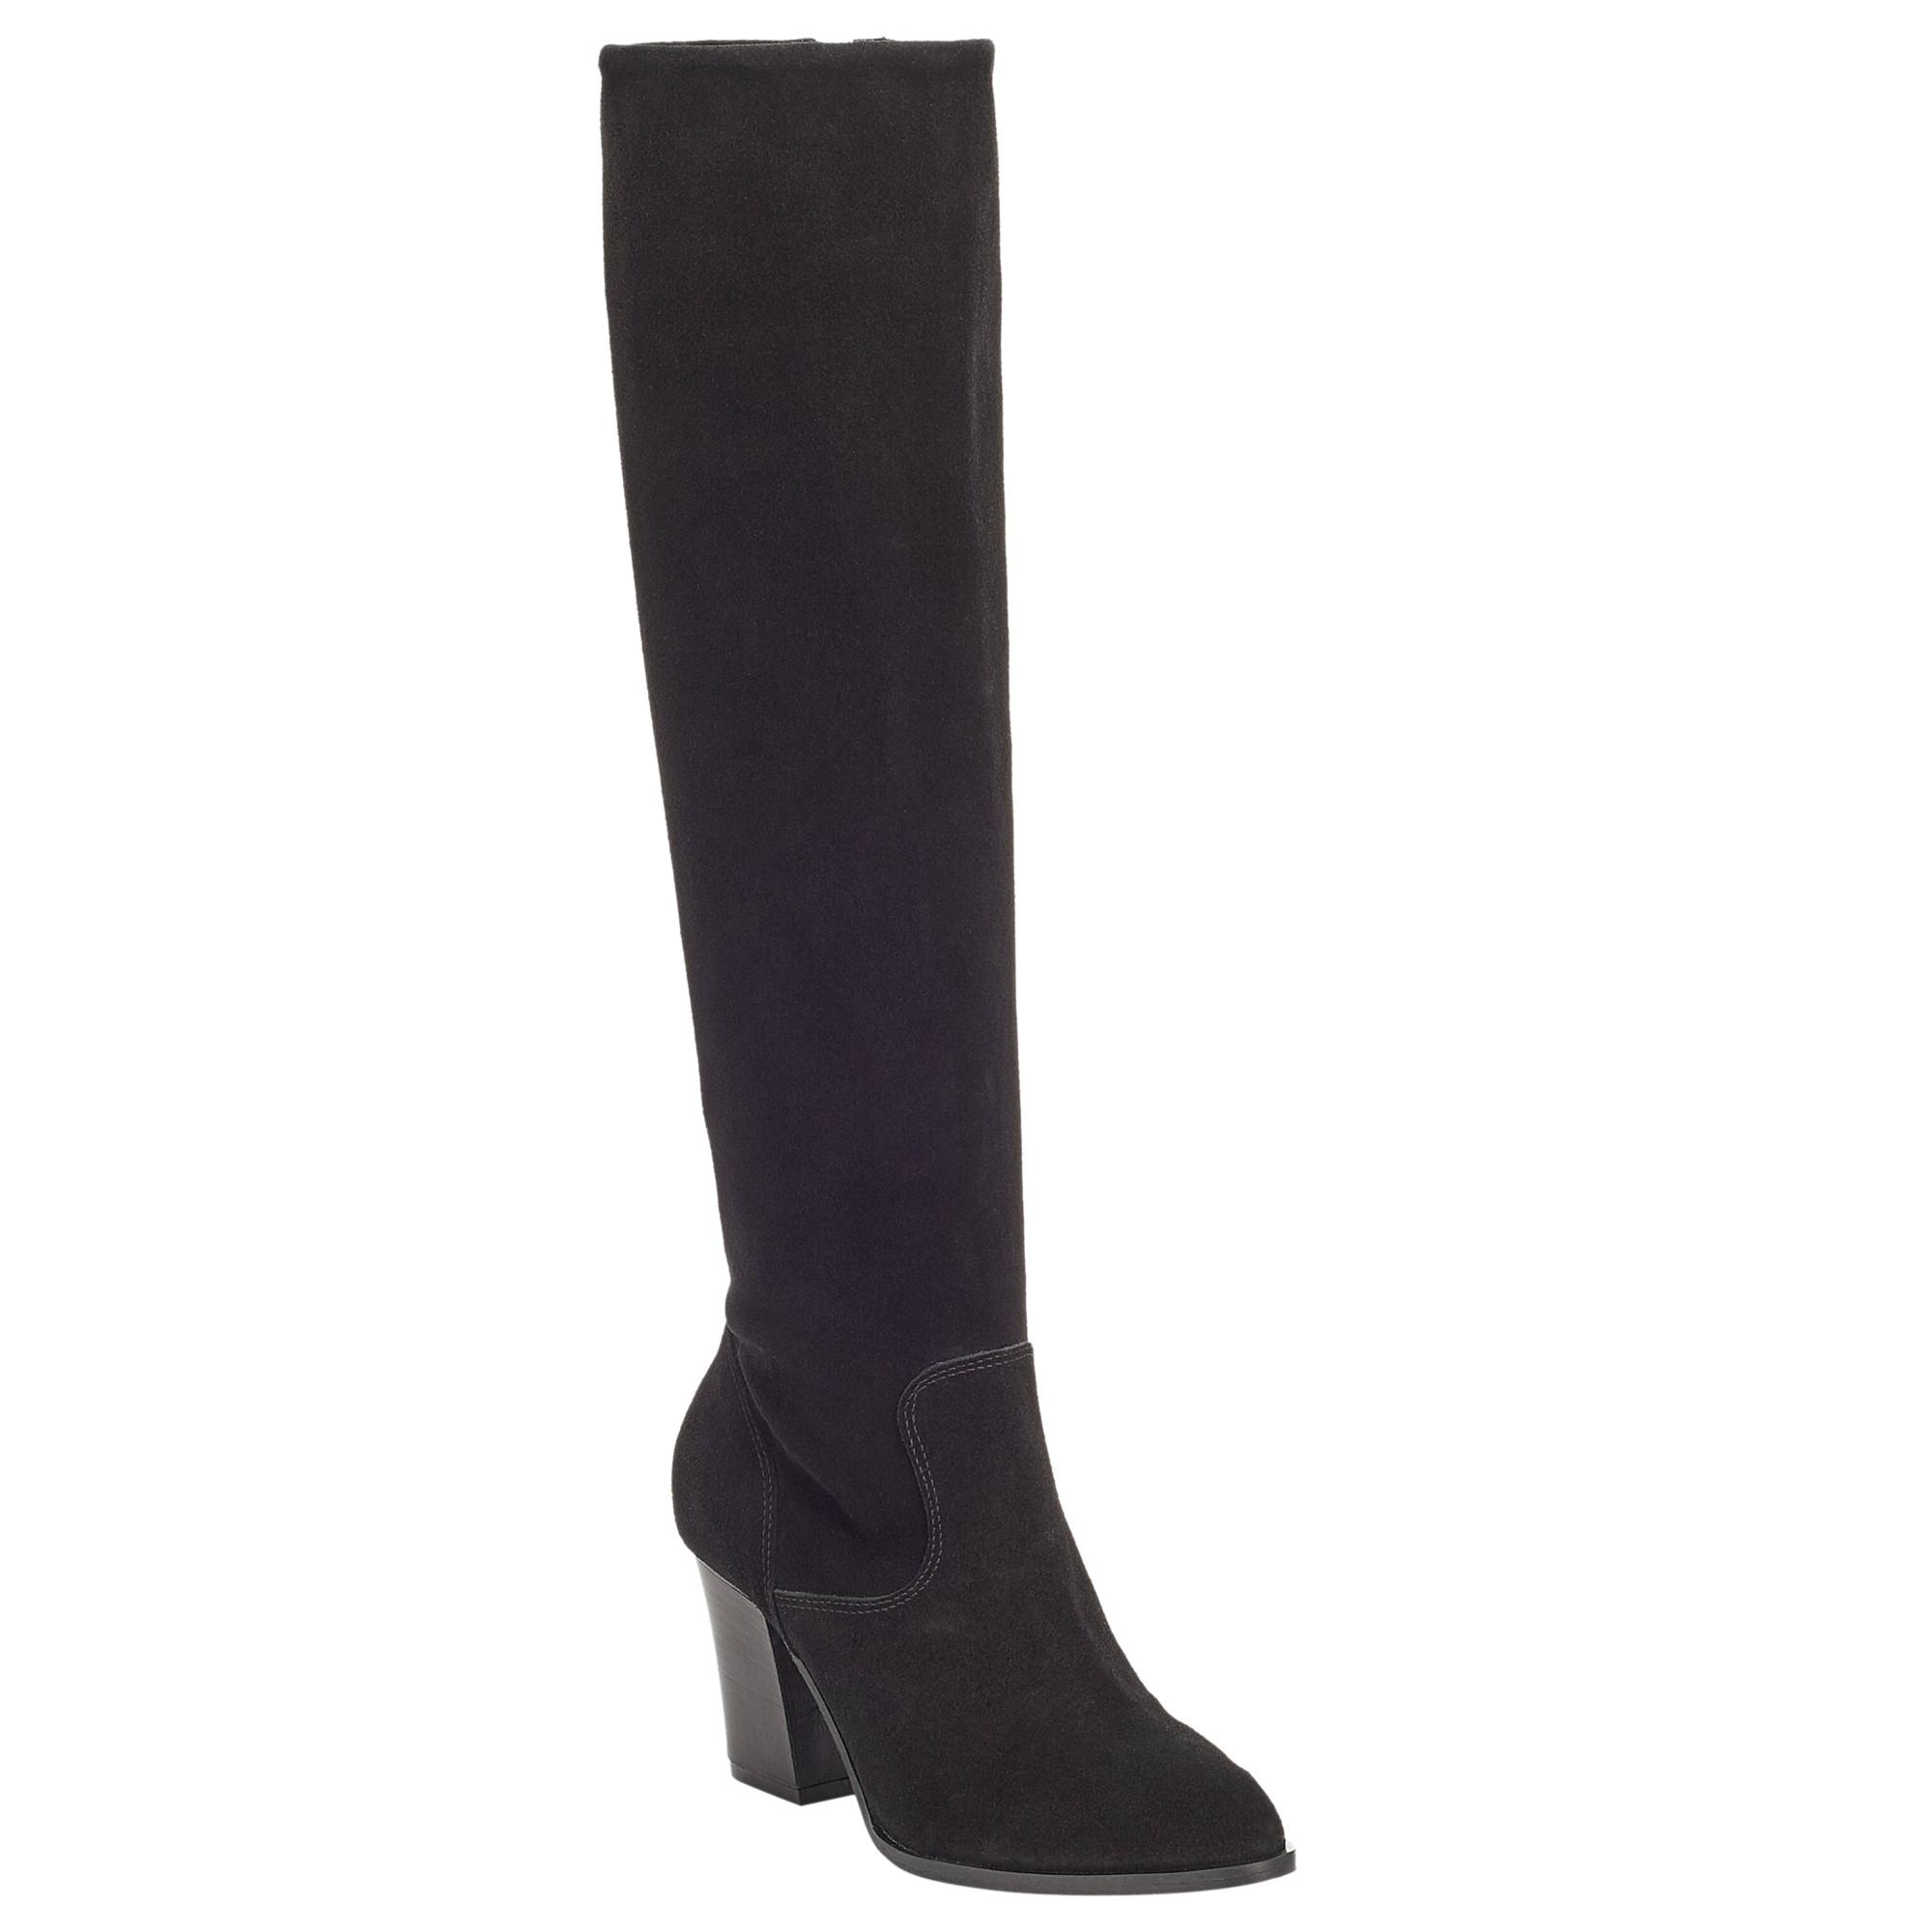 John Lewis Sheena Long Suede Knee High Boots in Black